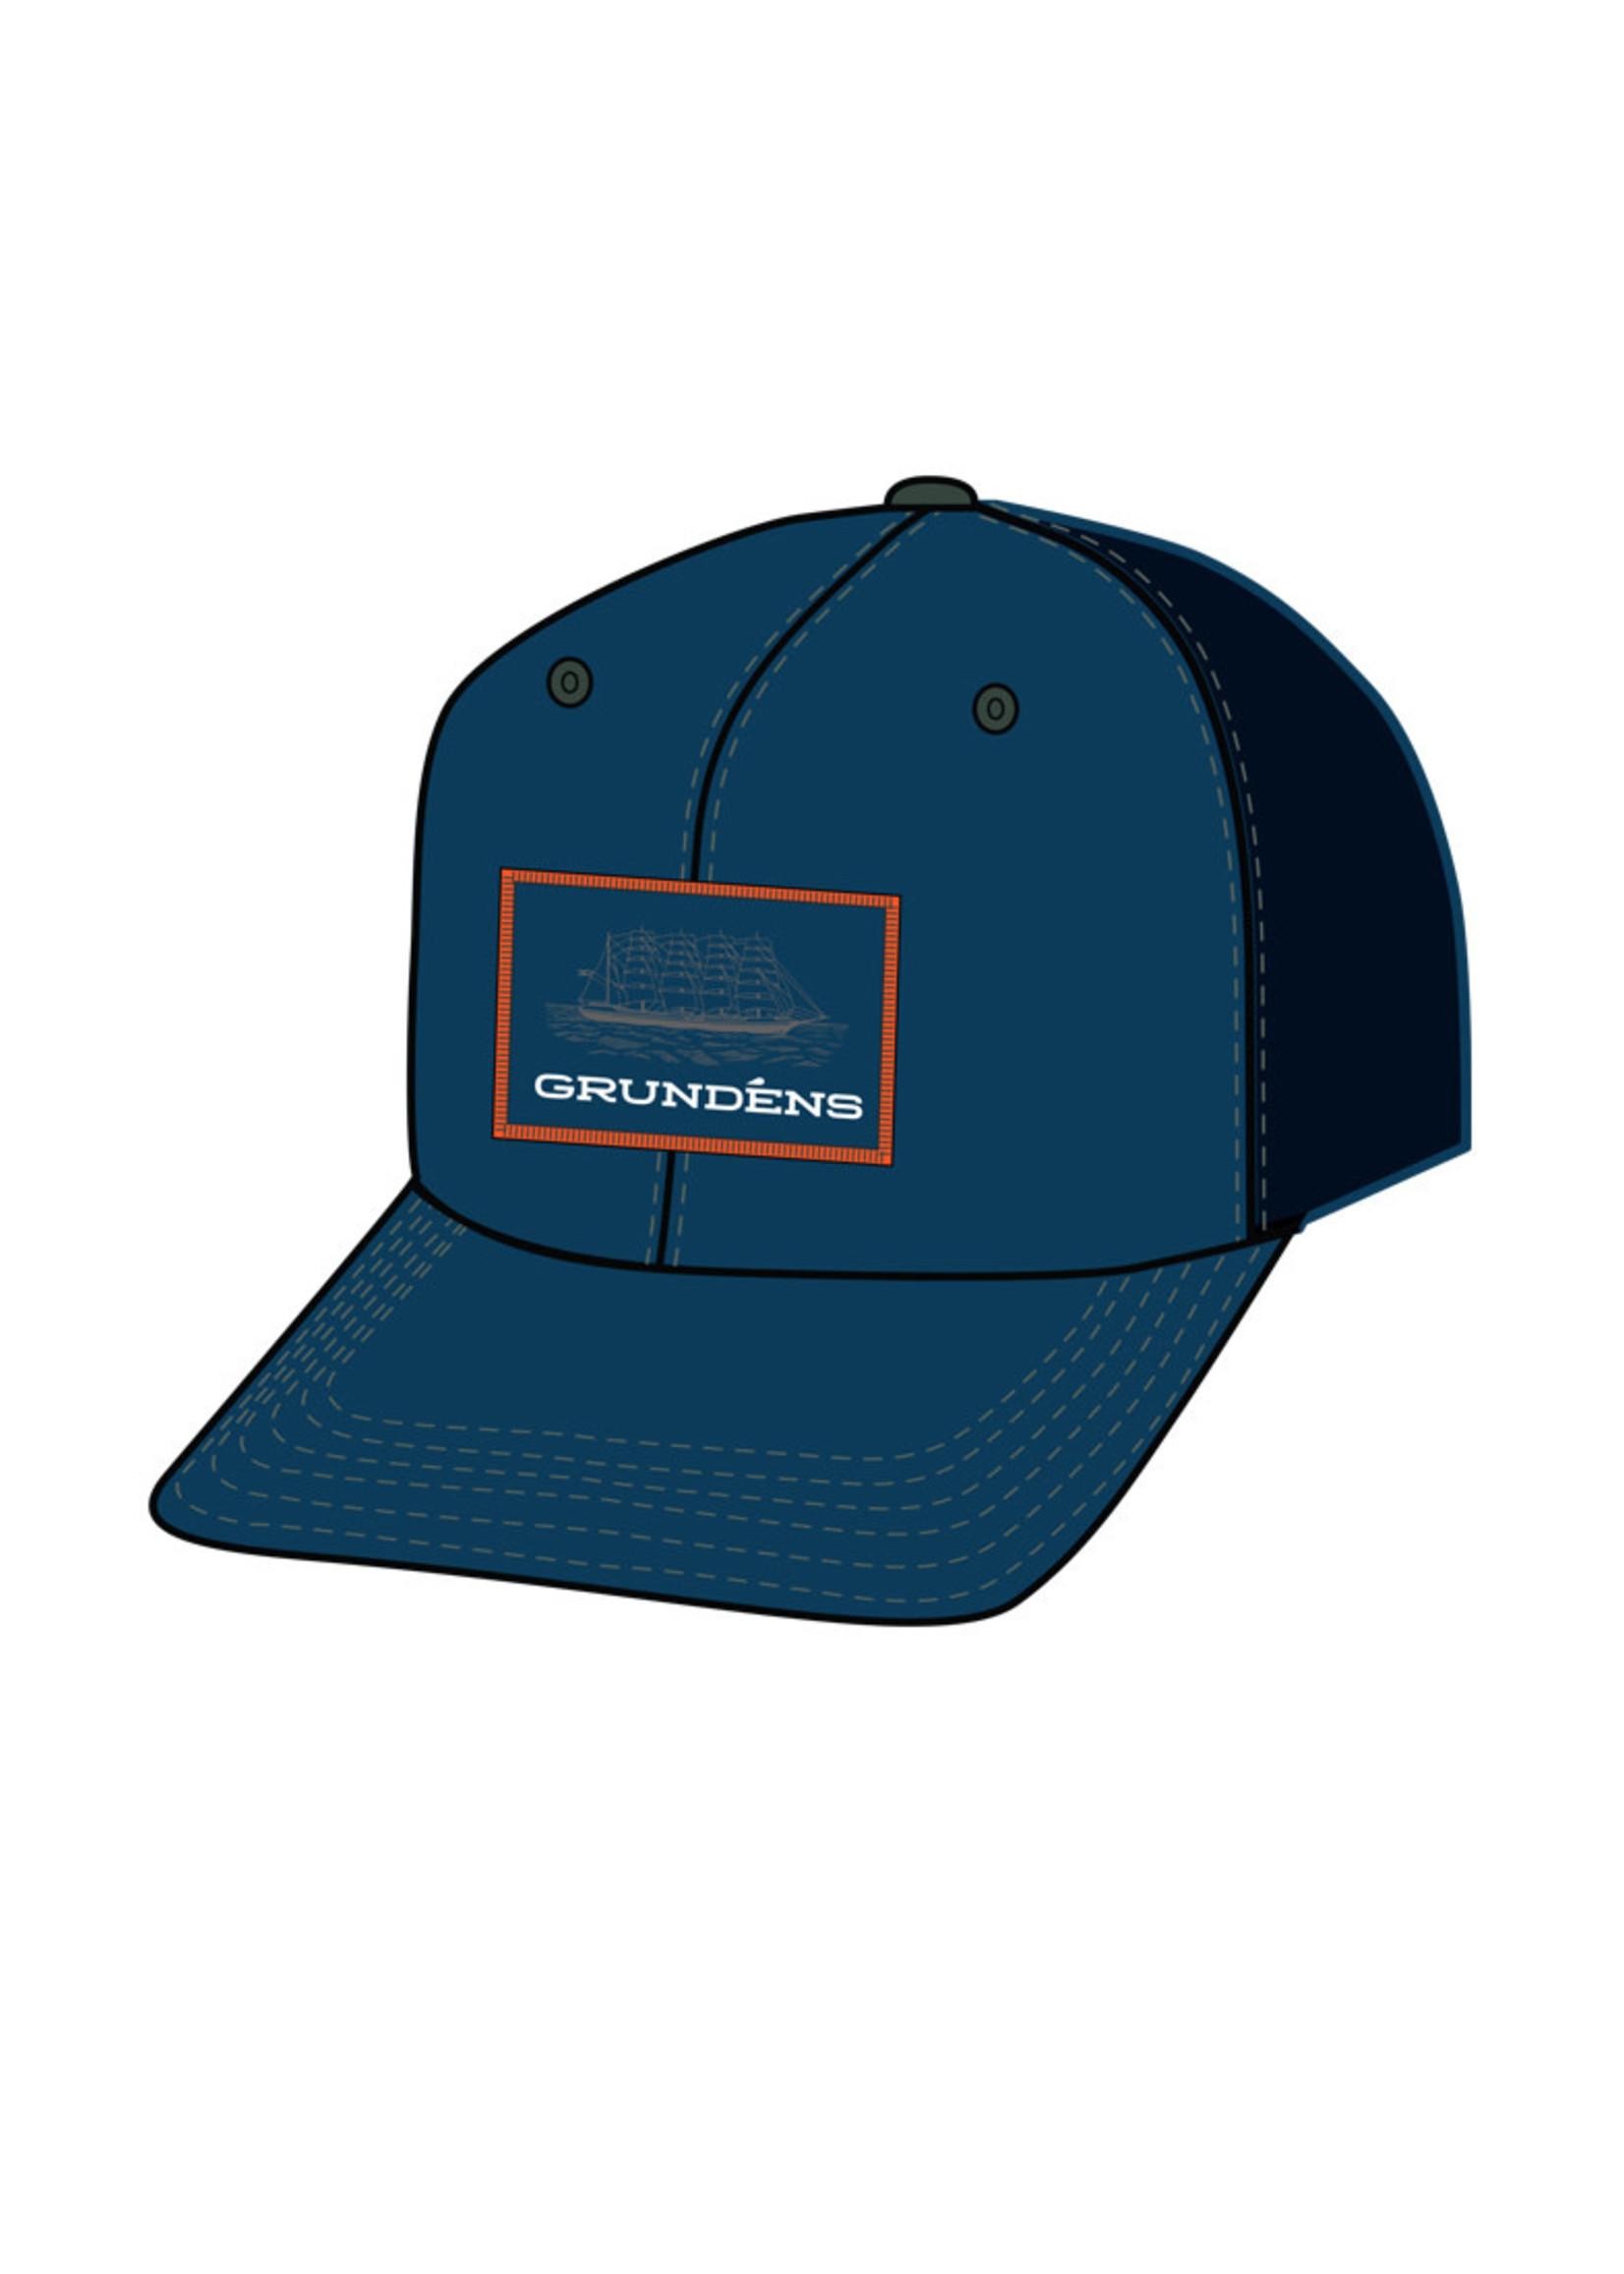 GRUNDENS USA, LTD. Grundens Clipper Hat O/S